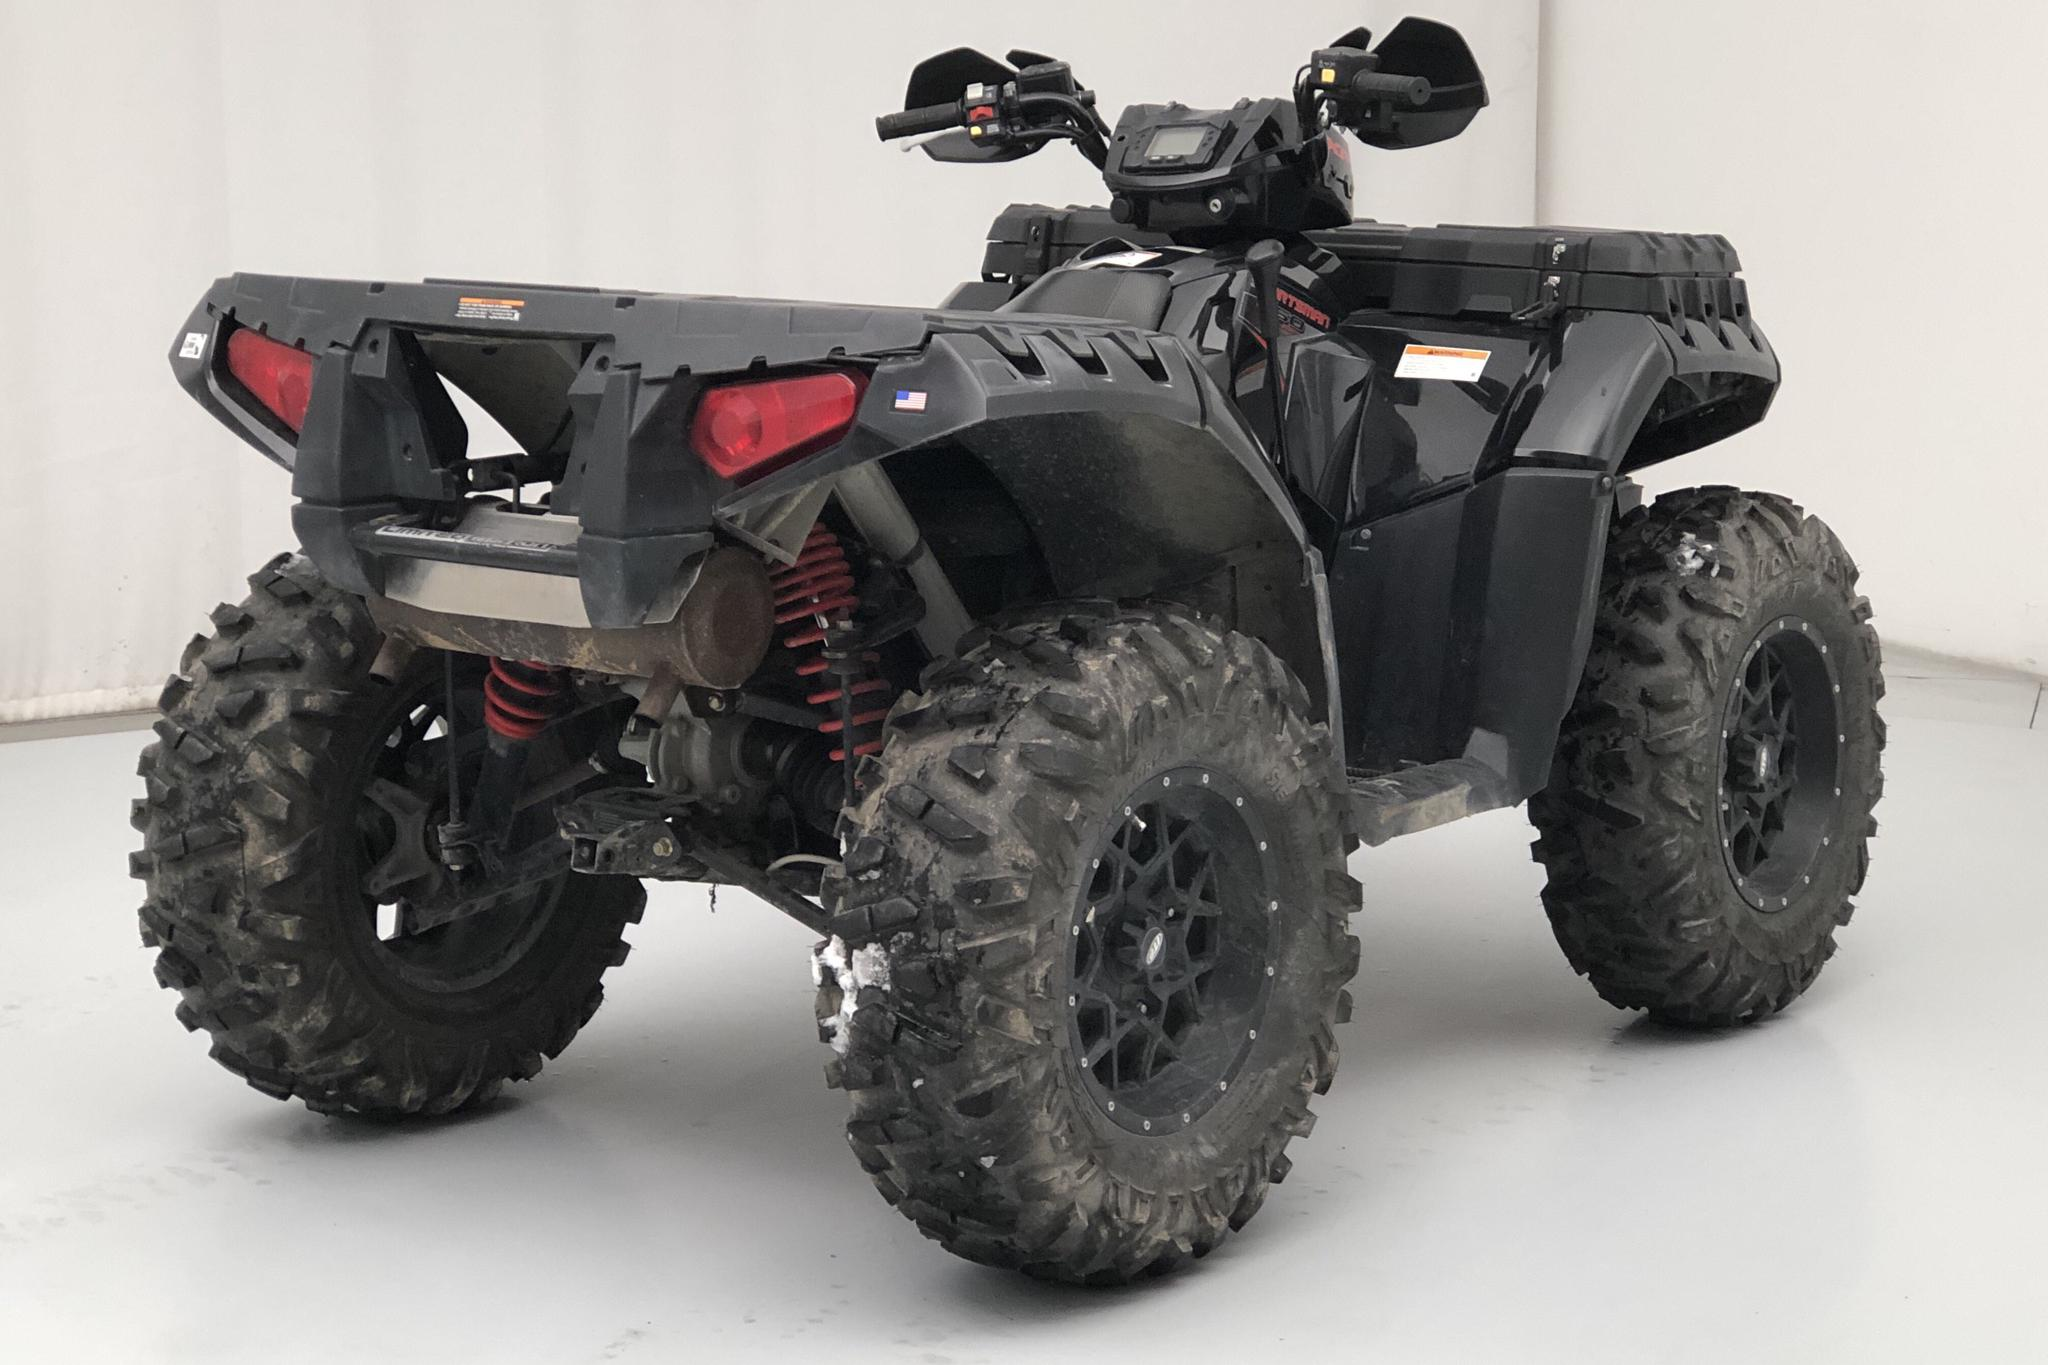 POLARIS SPORTSMAN XPS 850 EFI LIMITED EDITION ATV - 6 650 km - Automatic - black - 2011